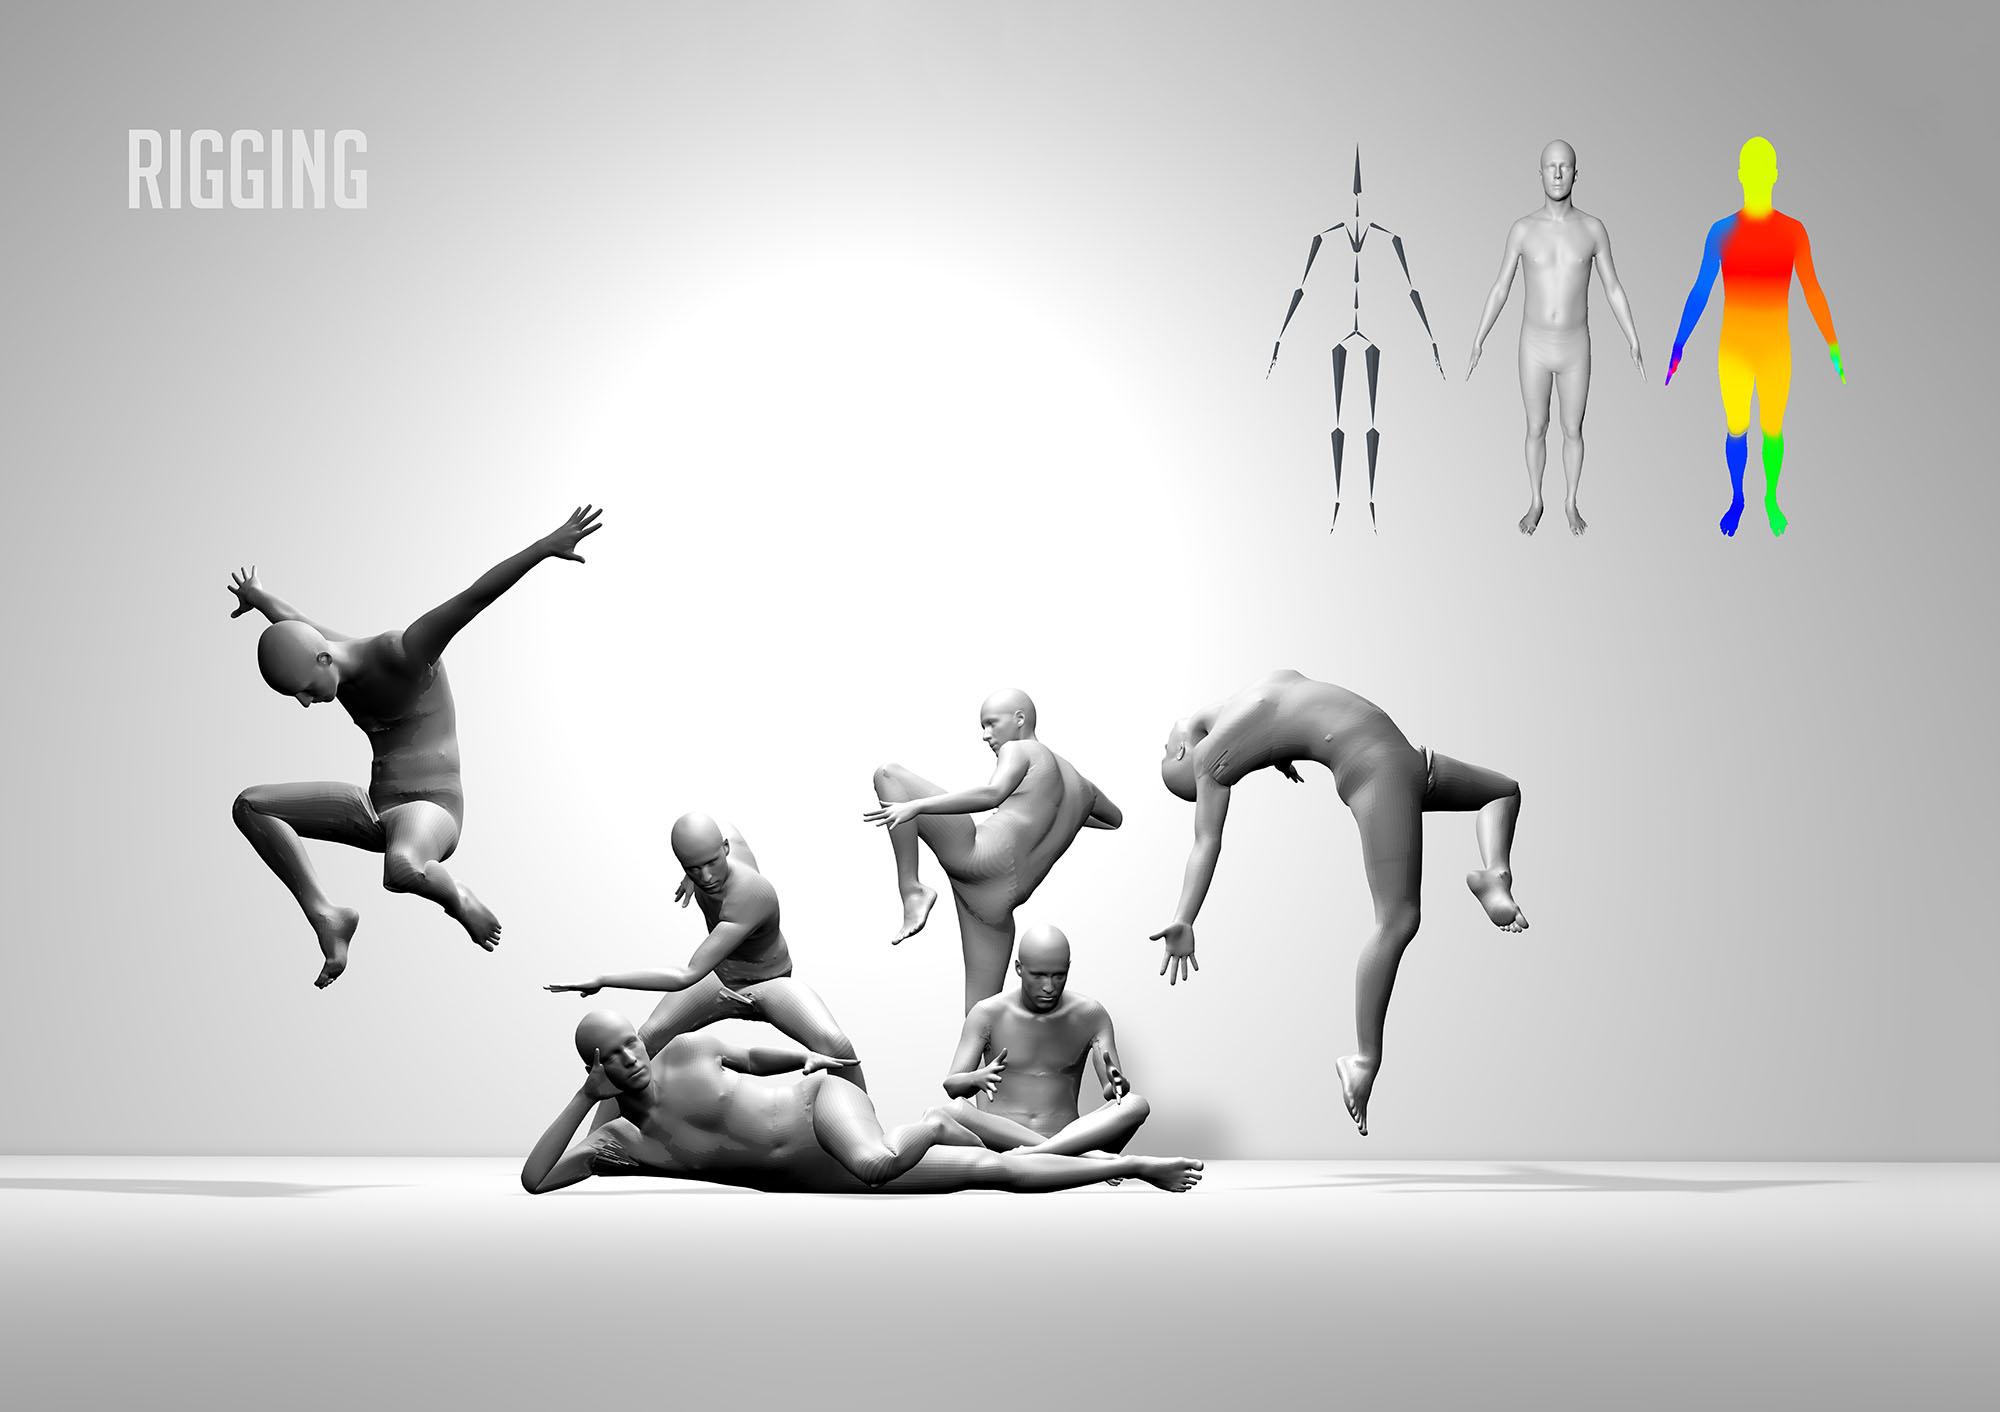 Animating Manikins